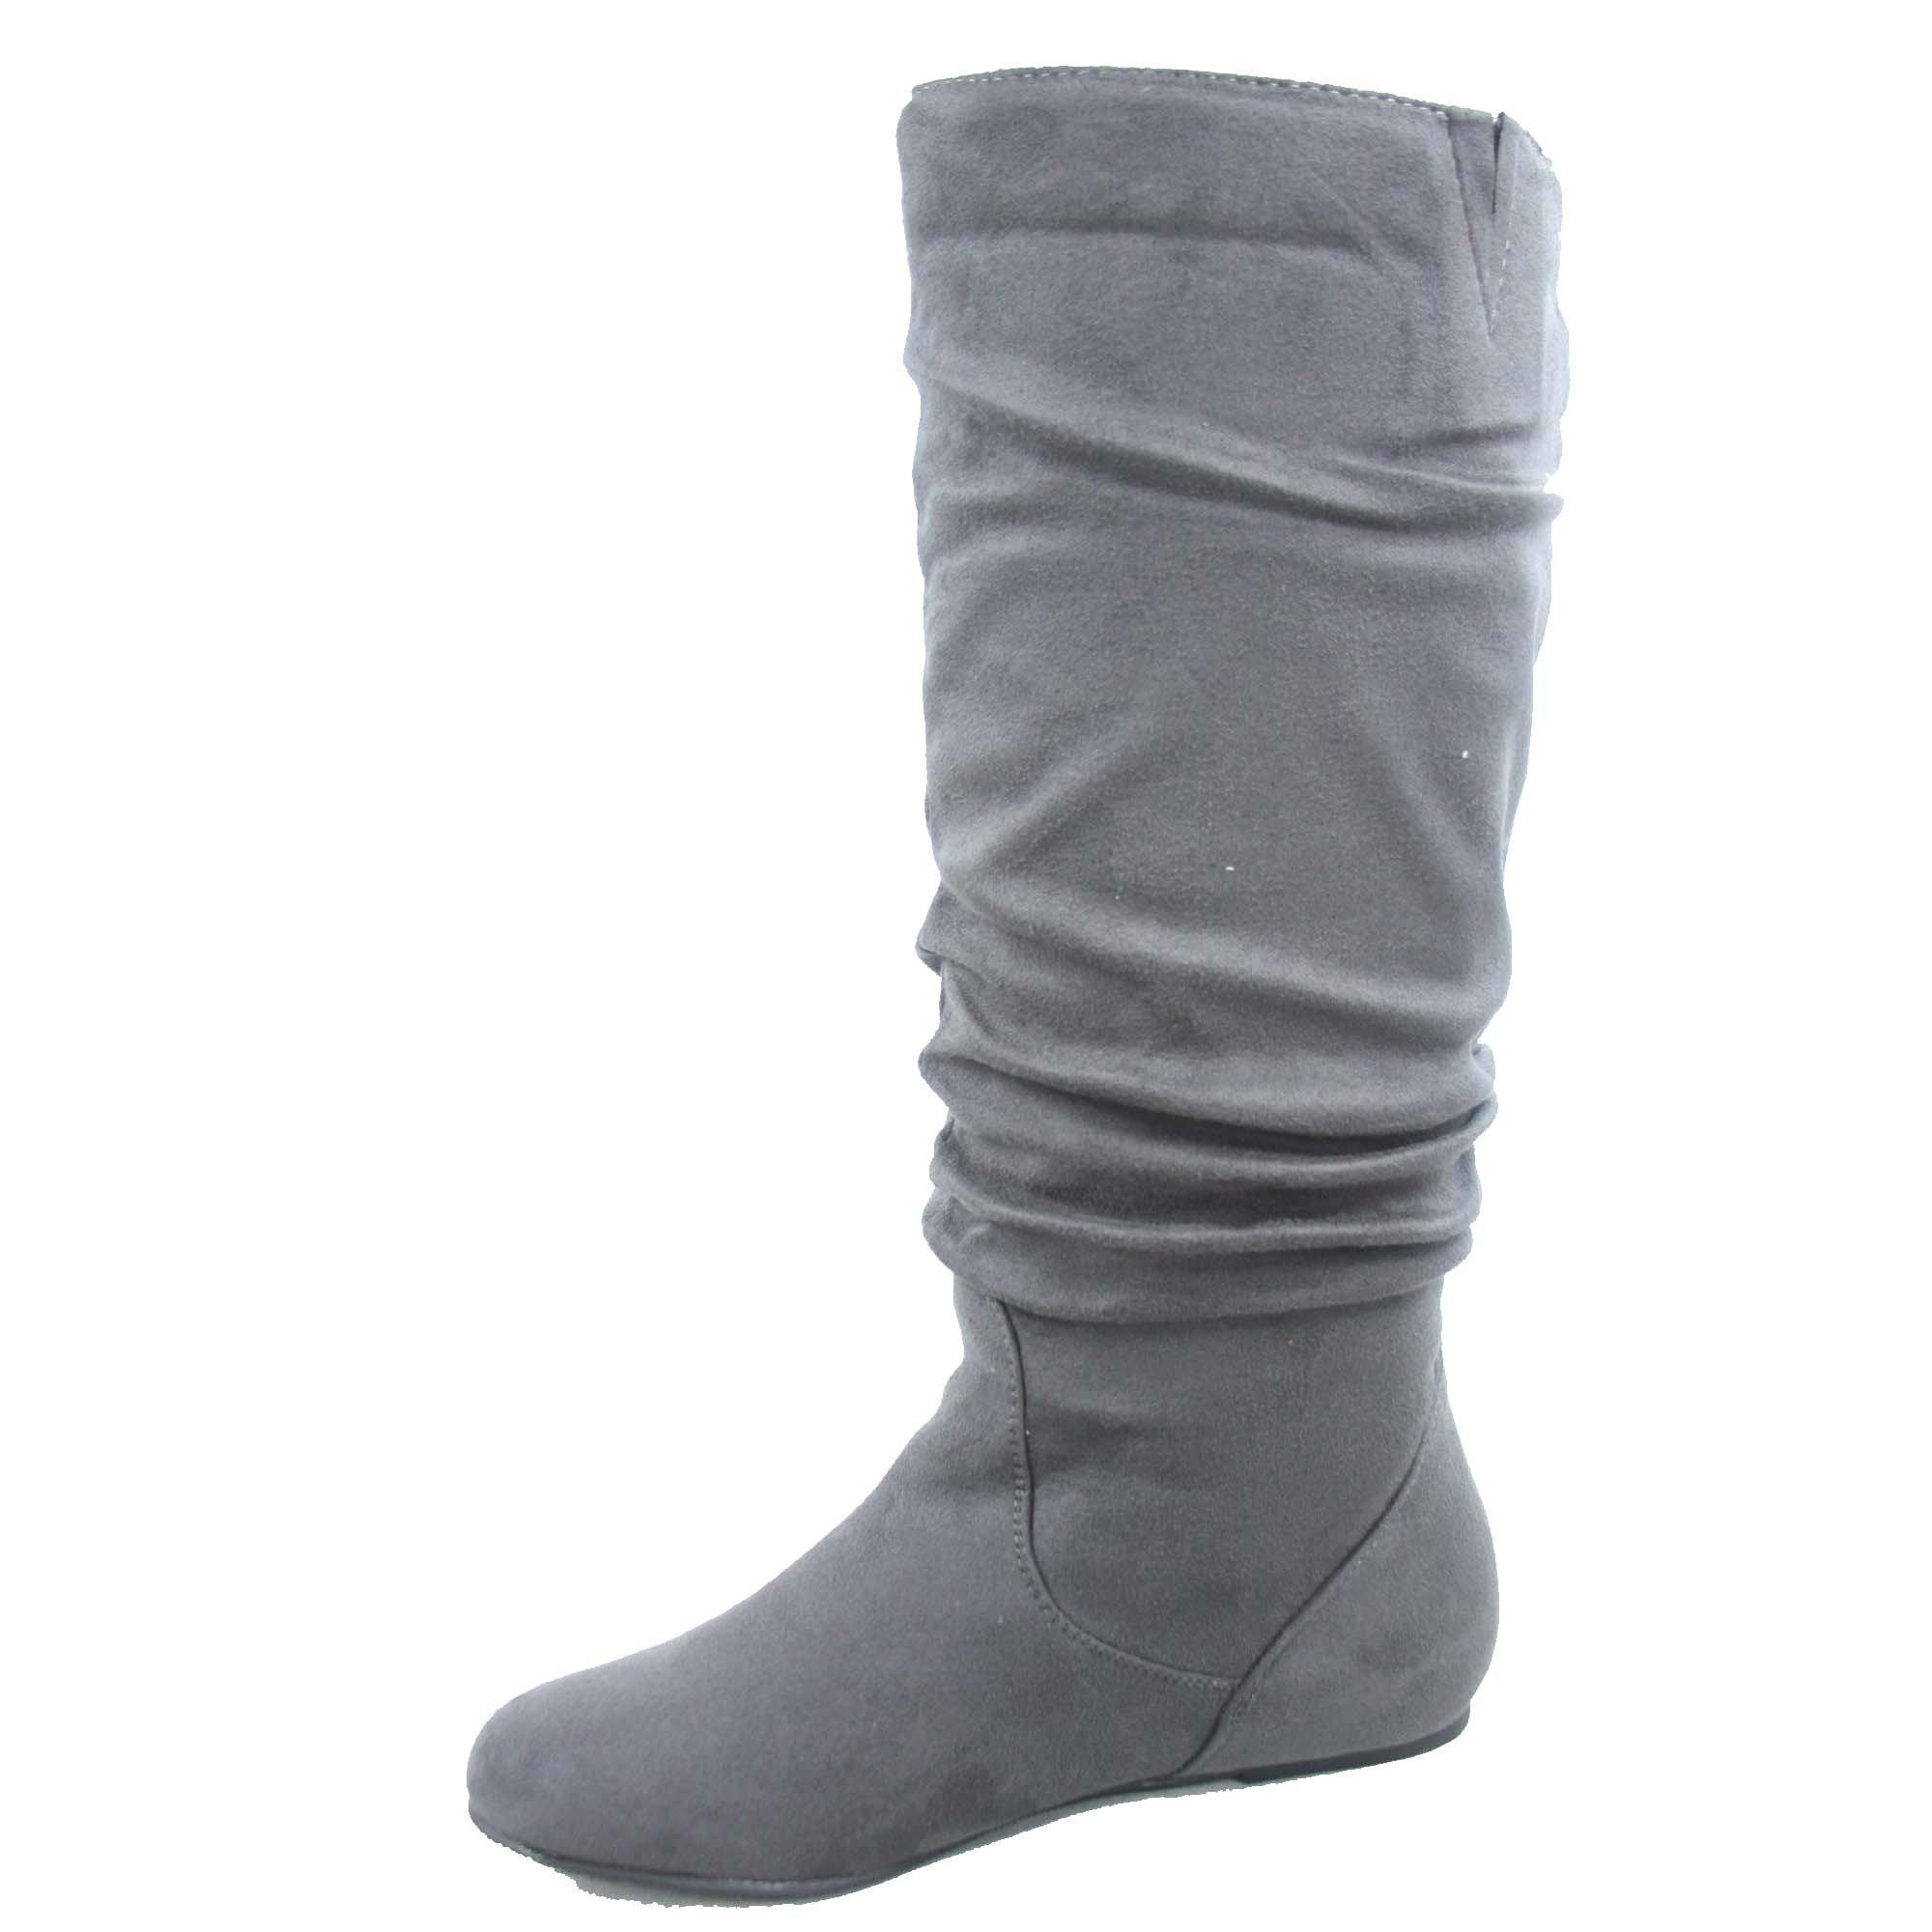 Top Moda Data-1 Women's Shoes Cute & Comfort Round Toe Flat Heel Slouchy Mid Calf Boot (7, Grey) by Top Moda (Image #2)